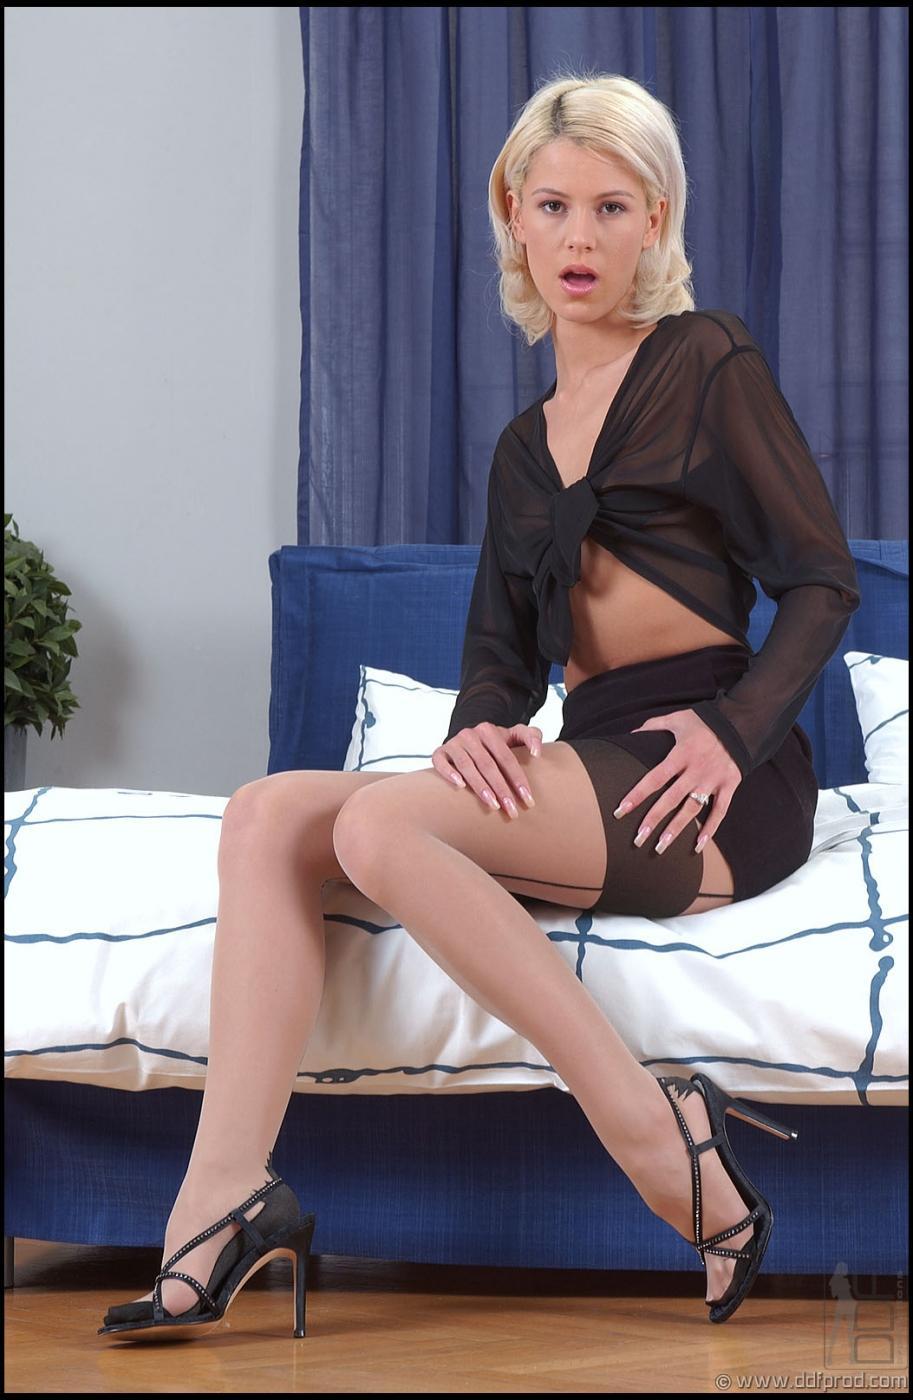 Светлая порноактриса Cora Carina похотливо снимает черное нижнее белое и курит